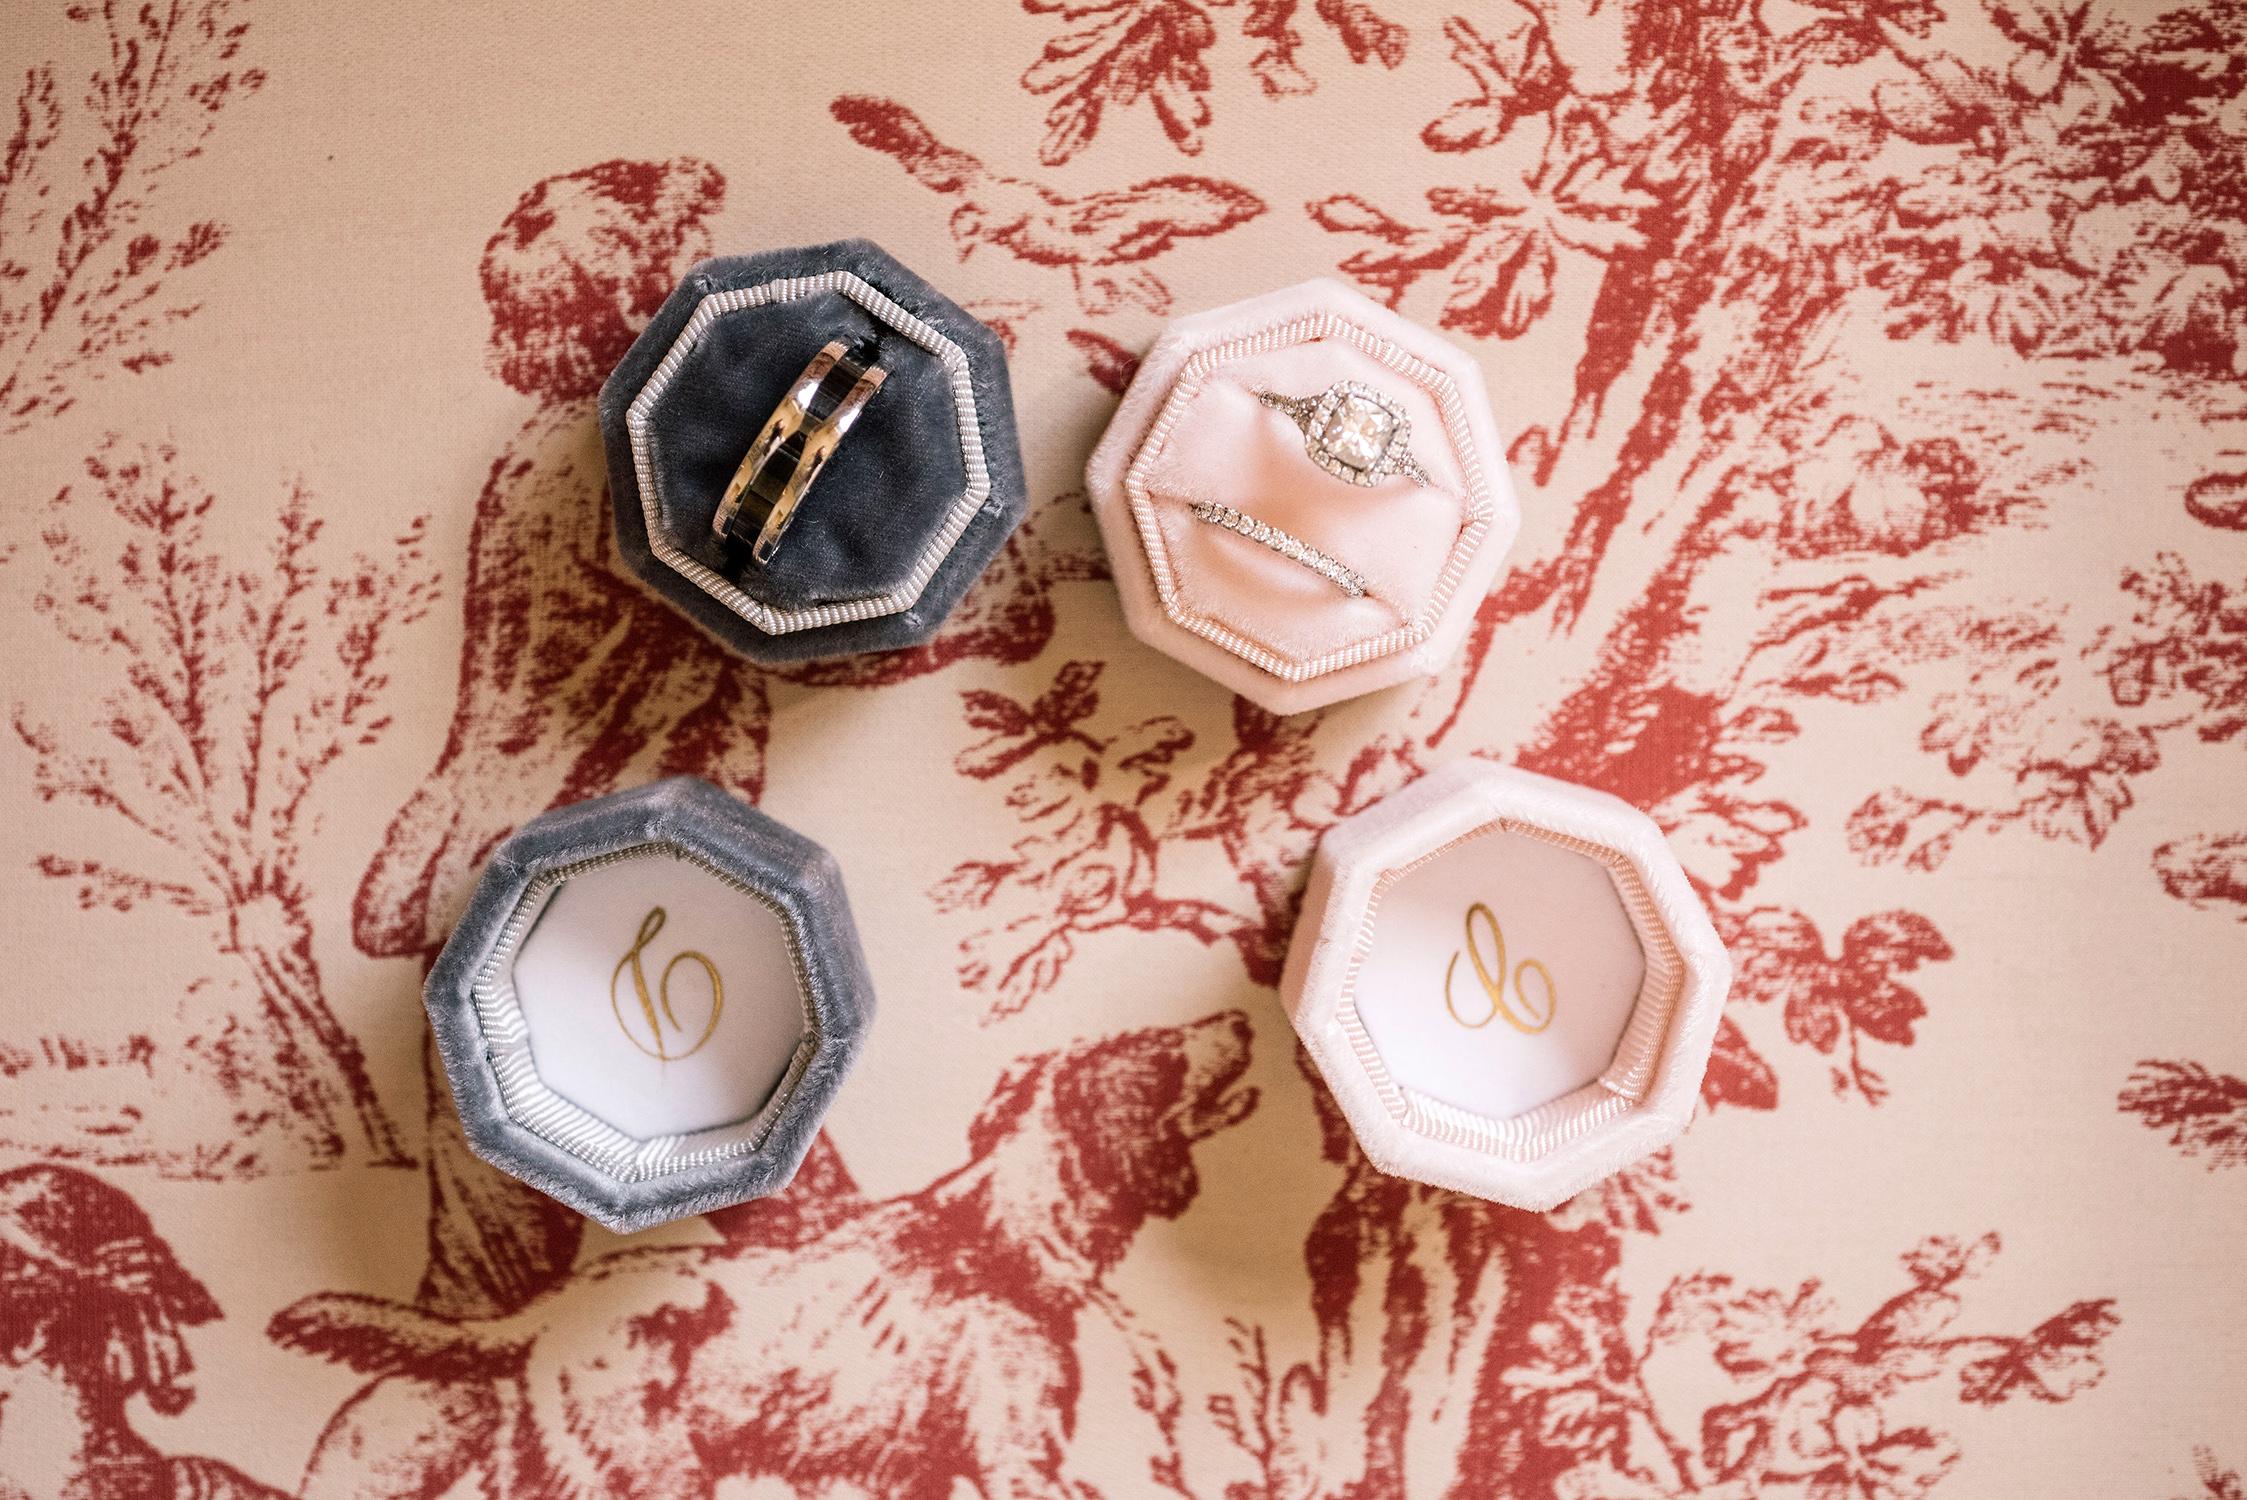 cara david wedding rings in decorative boxes